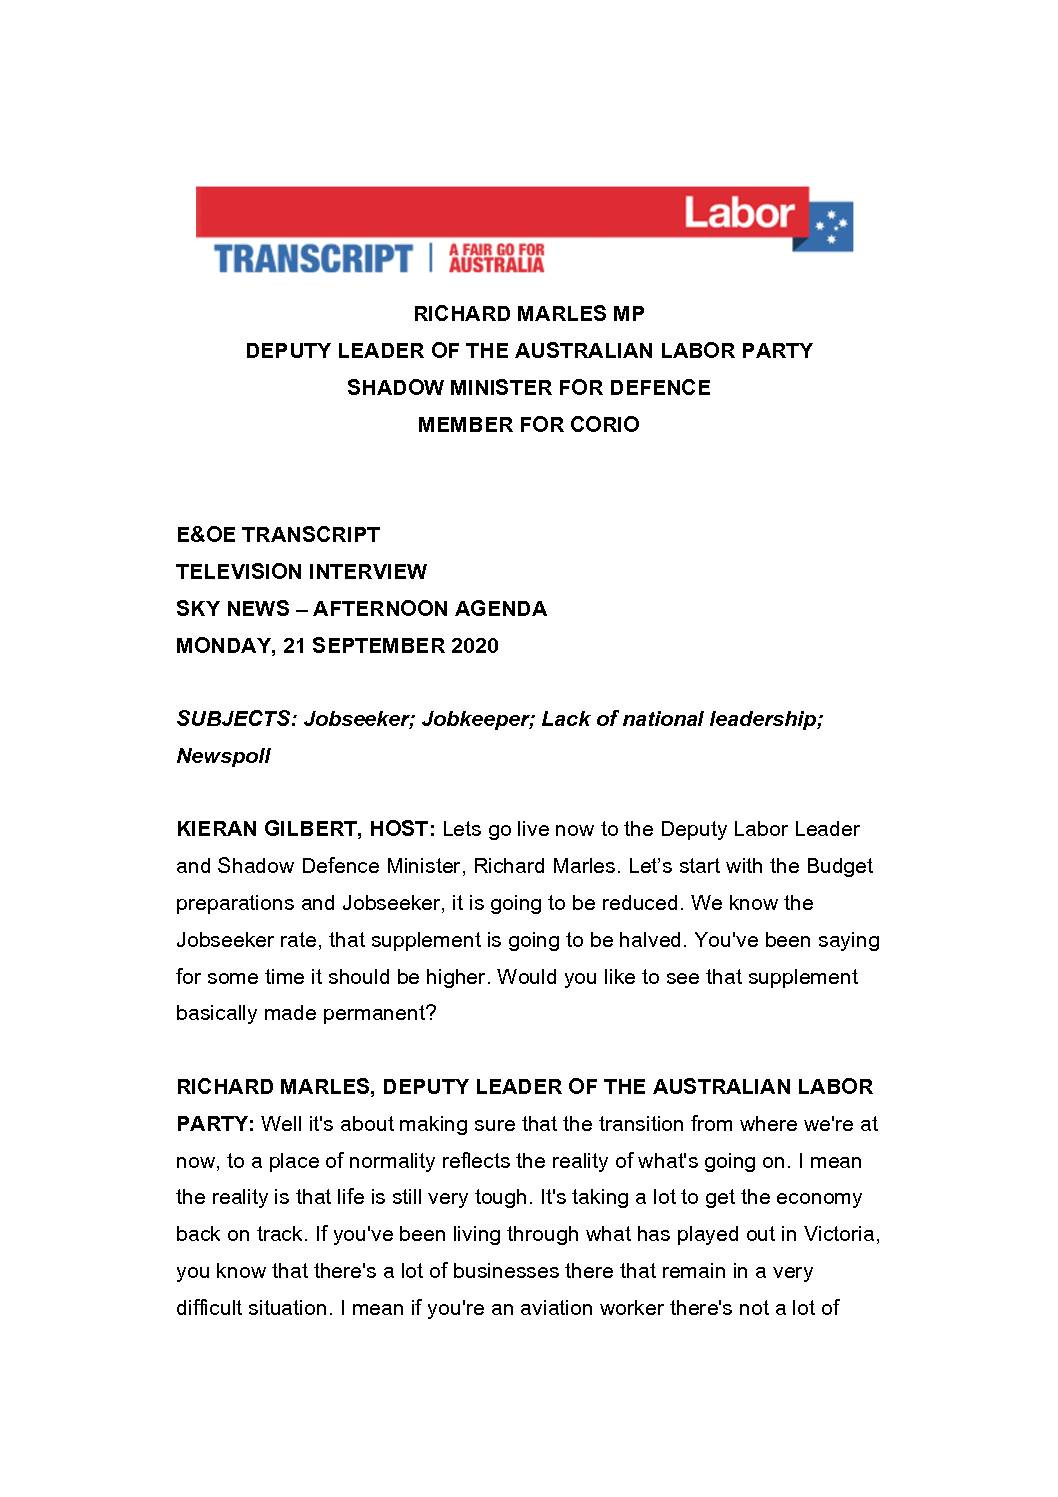 20.09.21-SKY-NEWS-AM-AGENDA-WITH-KIERAN-GILBERT-TRANSCRIPT